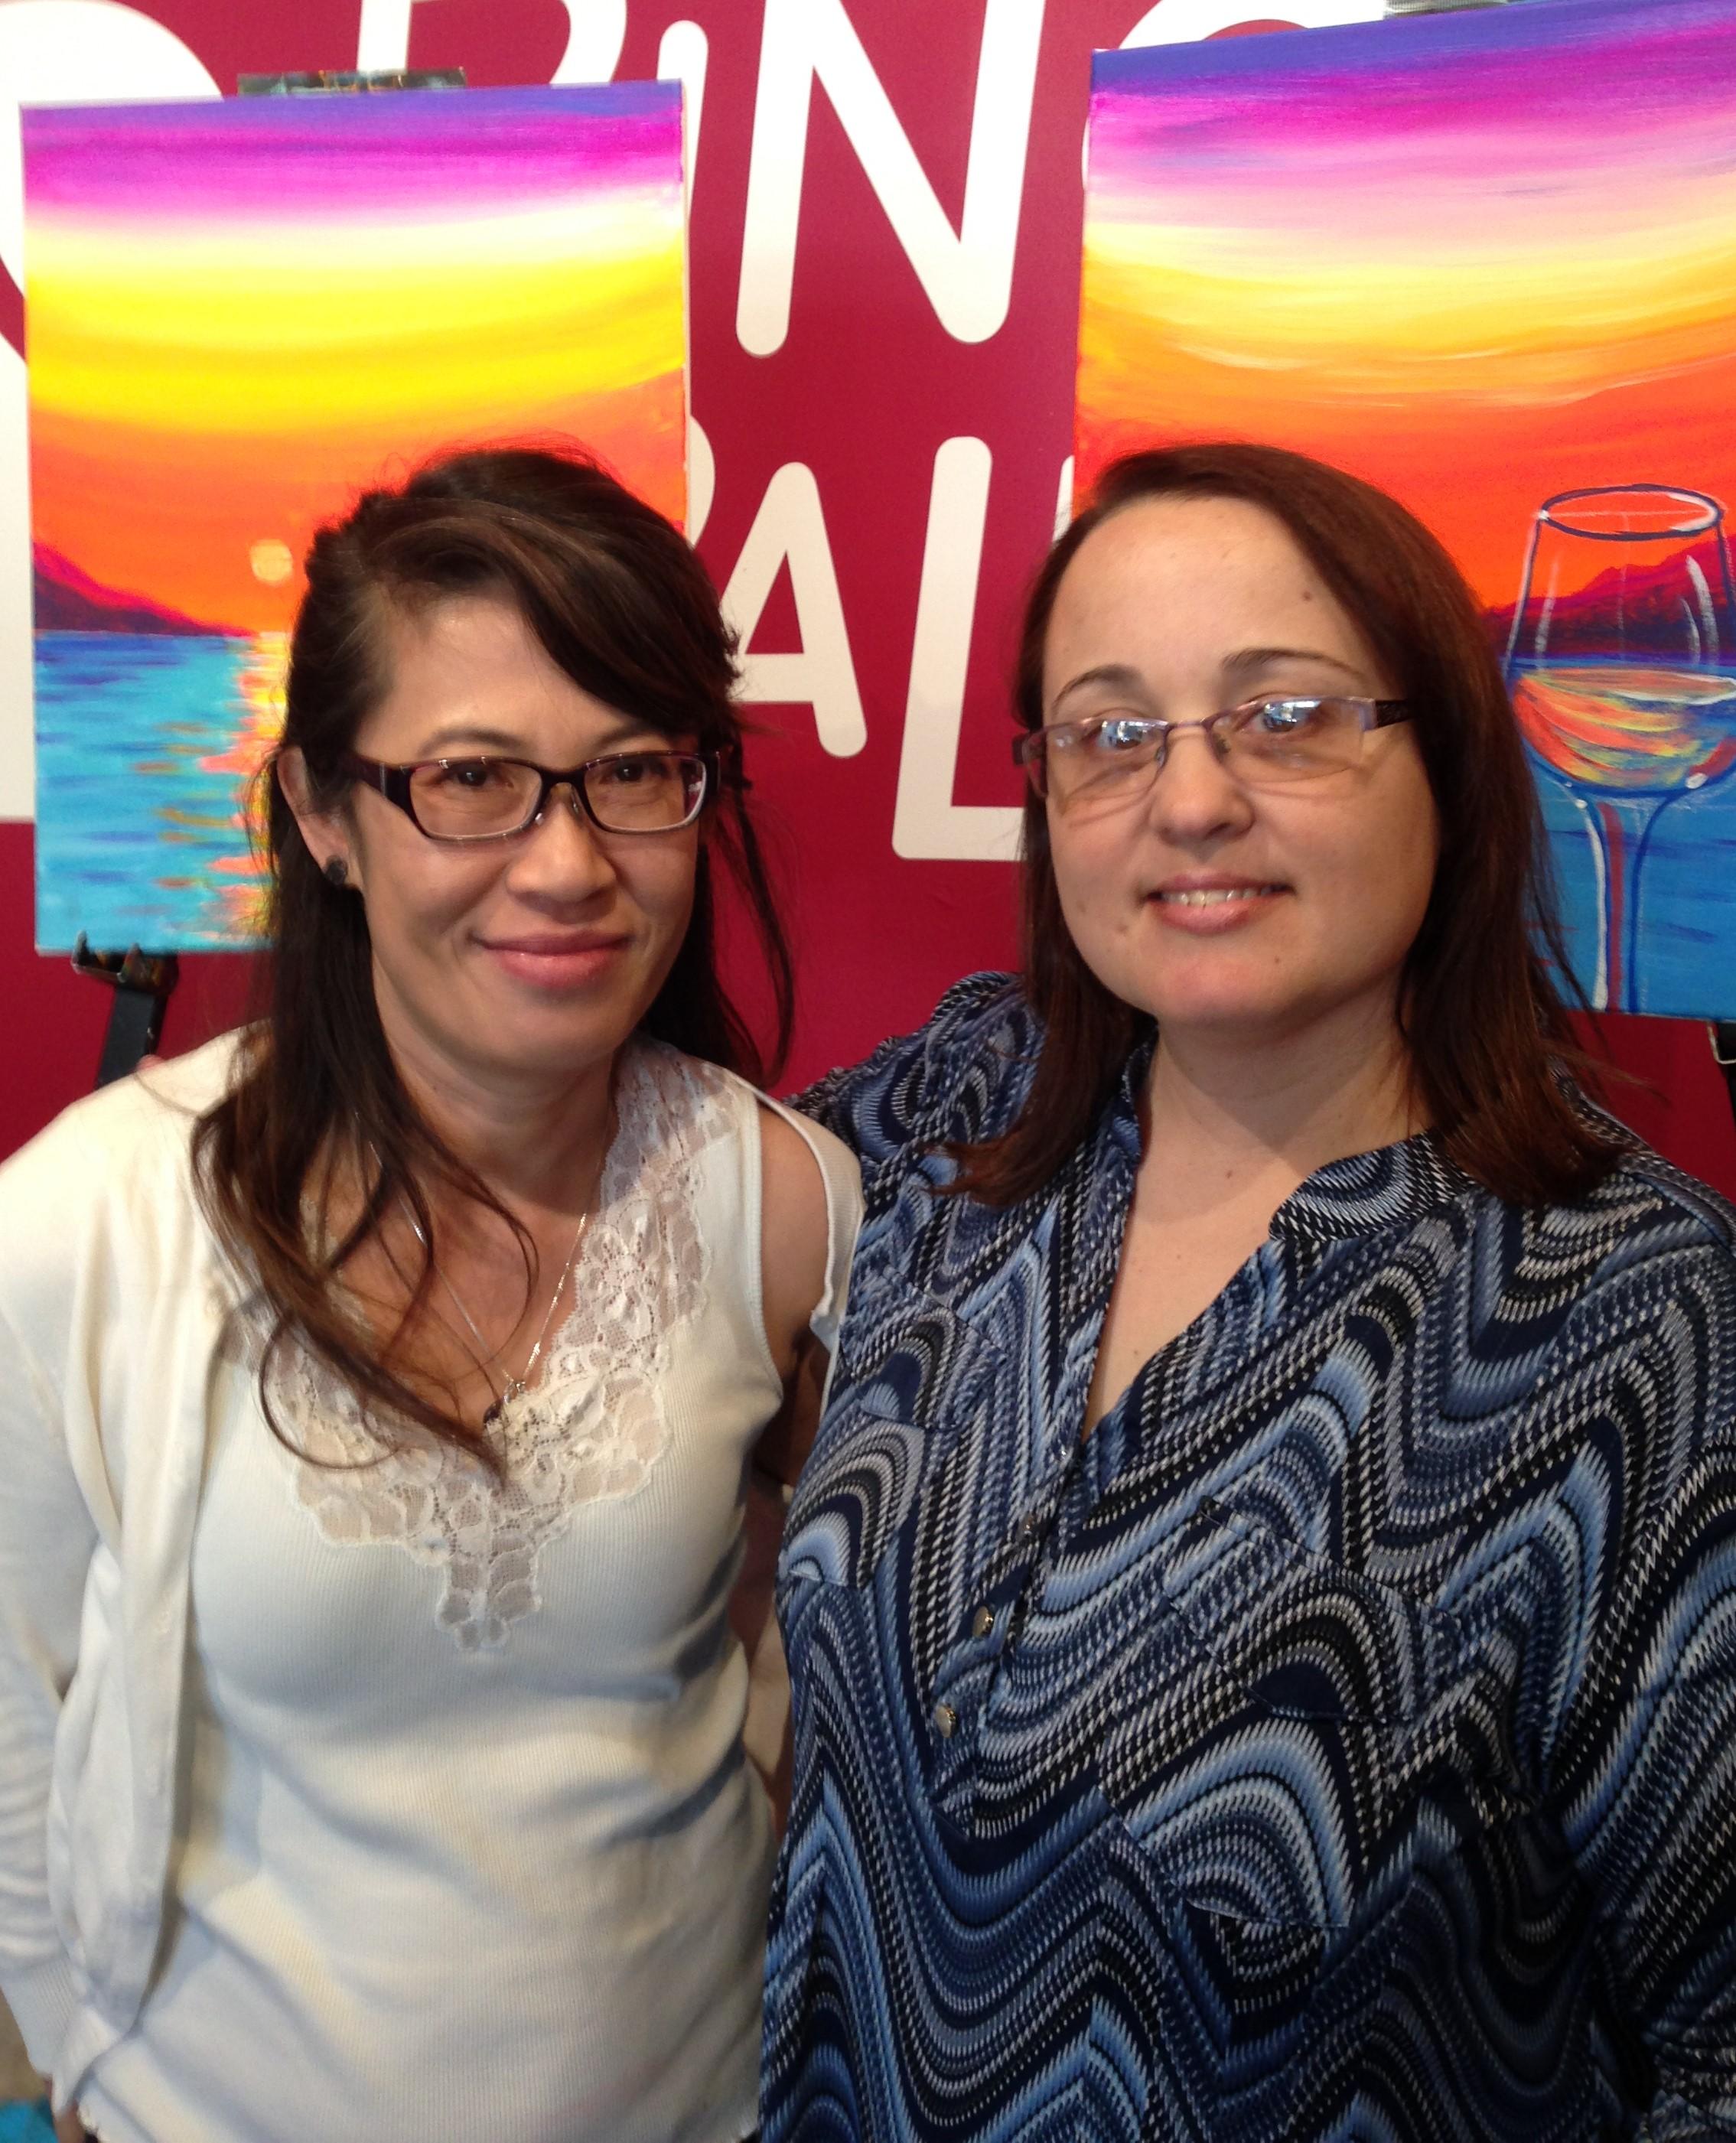 Kaneka Chim (left) - Event Organizer | Melissa Lewis (right) - director of OCSPCA